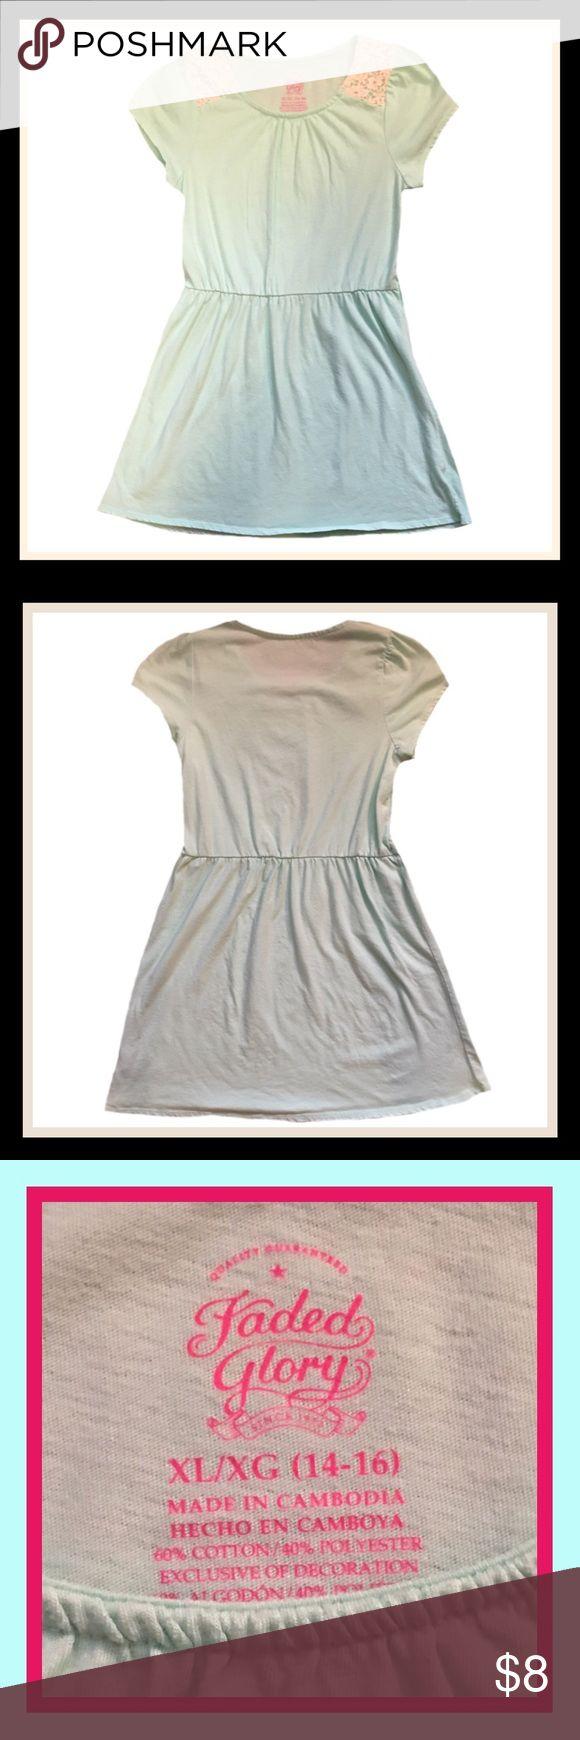 FADED GLORY Girl's Dress ➡️Gently used FADED GLORY girl's short sleeve casual dress.                                                                       ➡️Size XL (14/16)                                                                                                                          ➡️BUNDLE AND SAVE Faded Glory Dresses